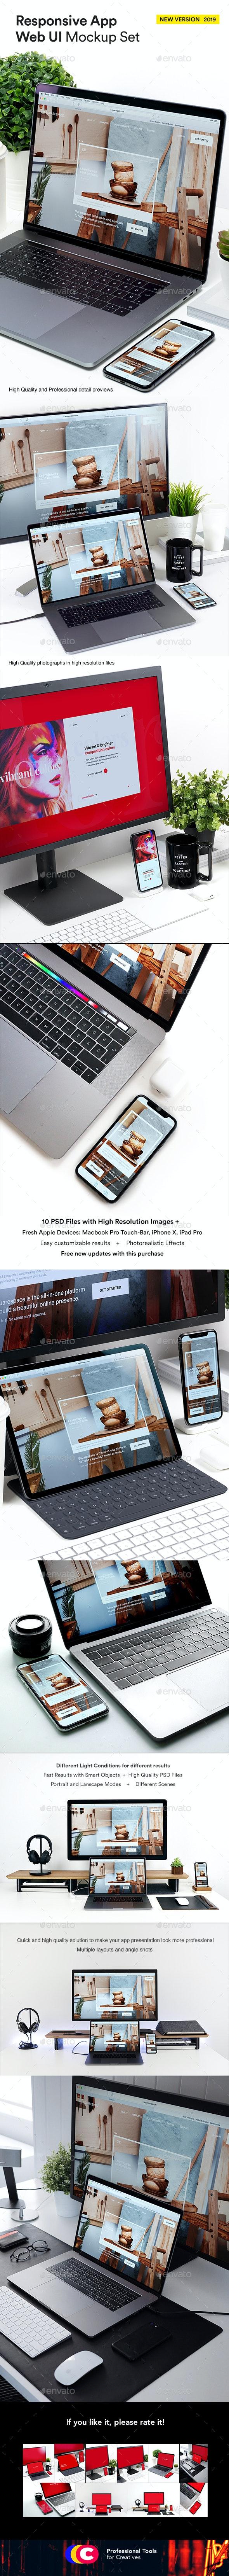 Responsive Mockup Set App Web UI Laptop Phone Tablet Pro